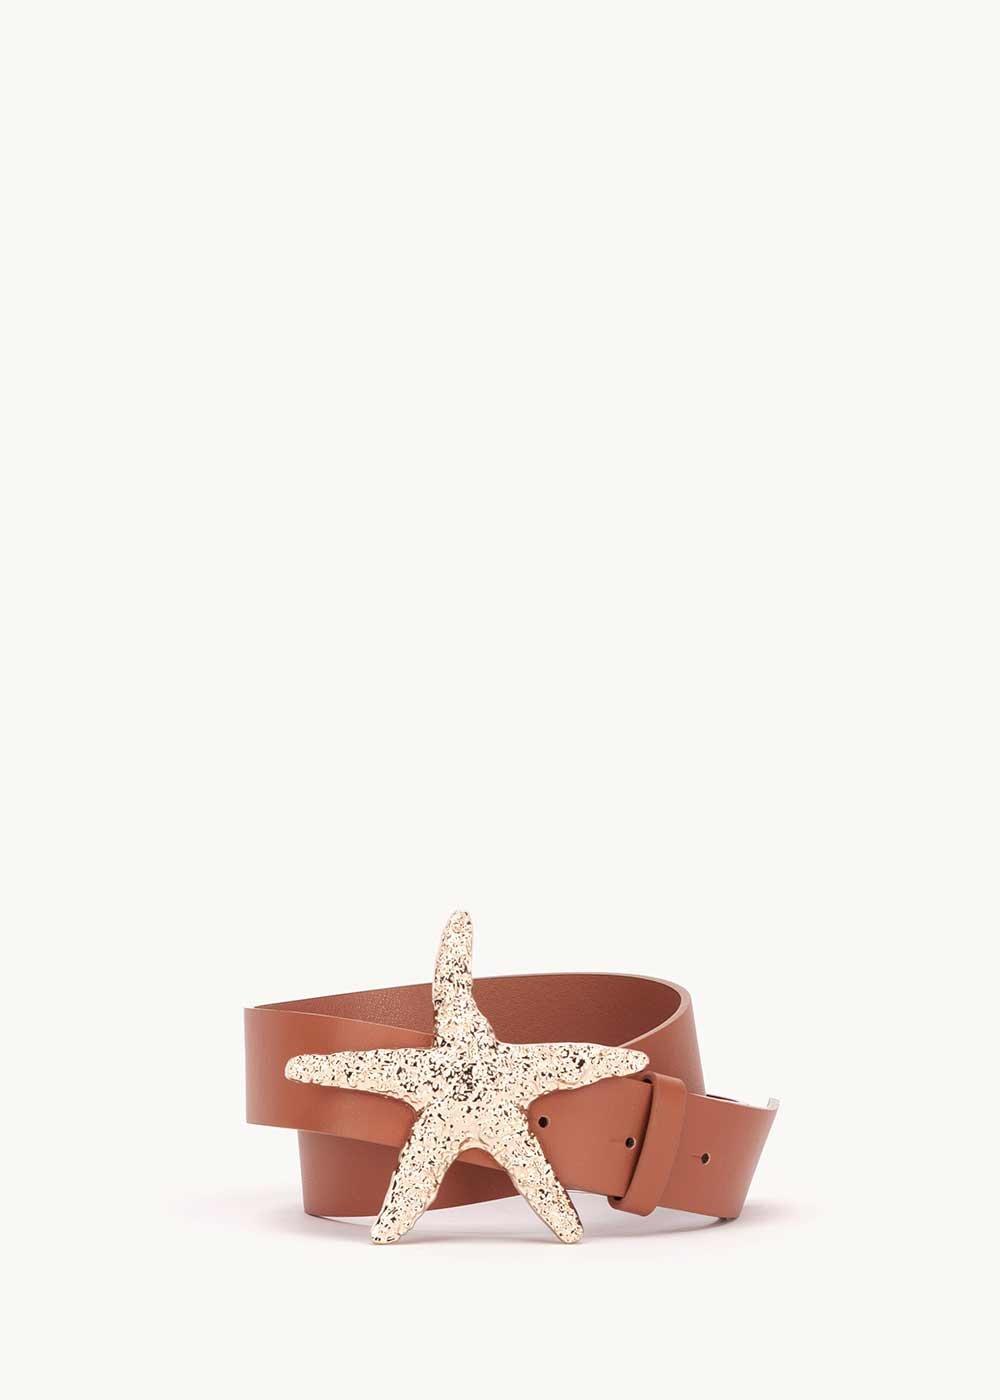 Cintura Candy con fibbia stella marina - Pecan - Donna